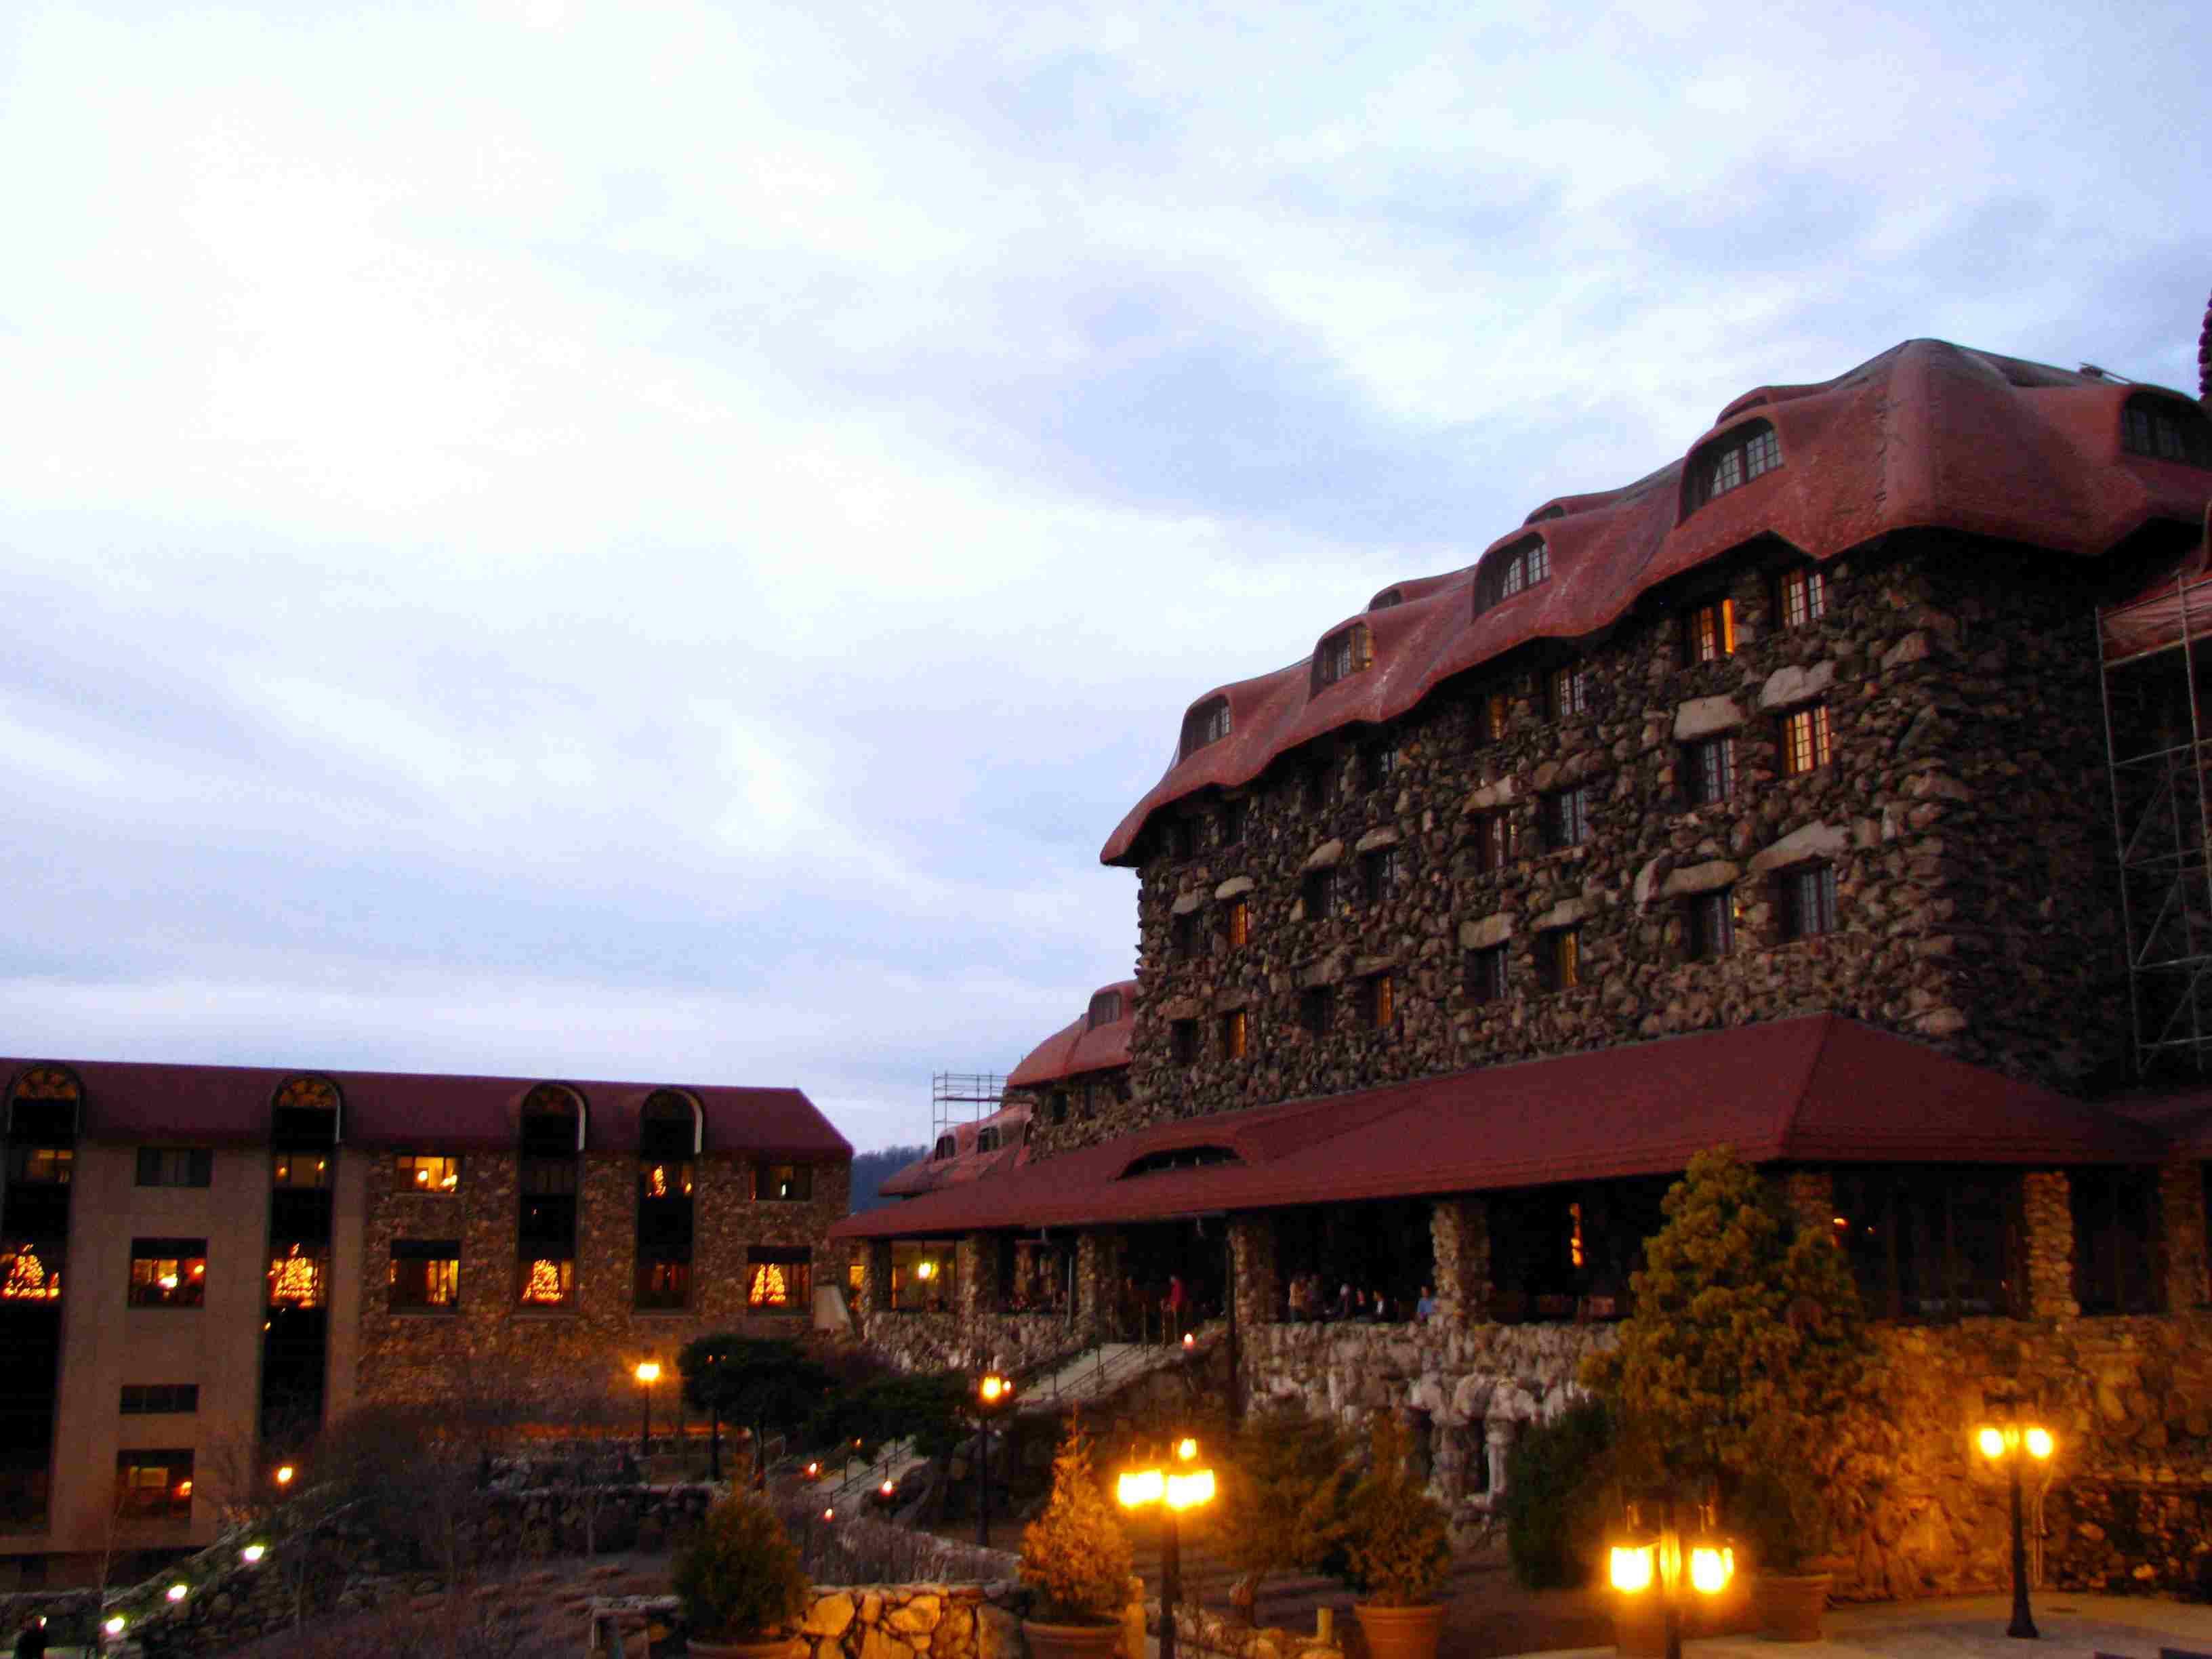 Grove Park Inn Resort and Spa, on Sunset Mountain